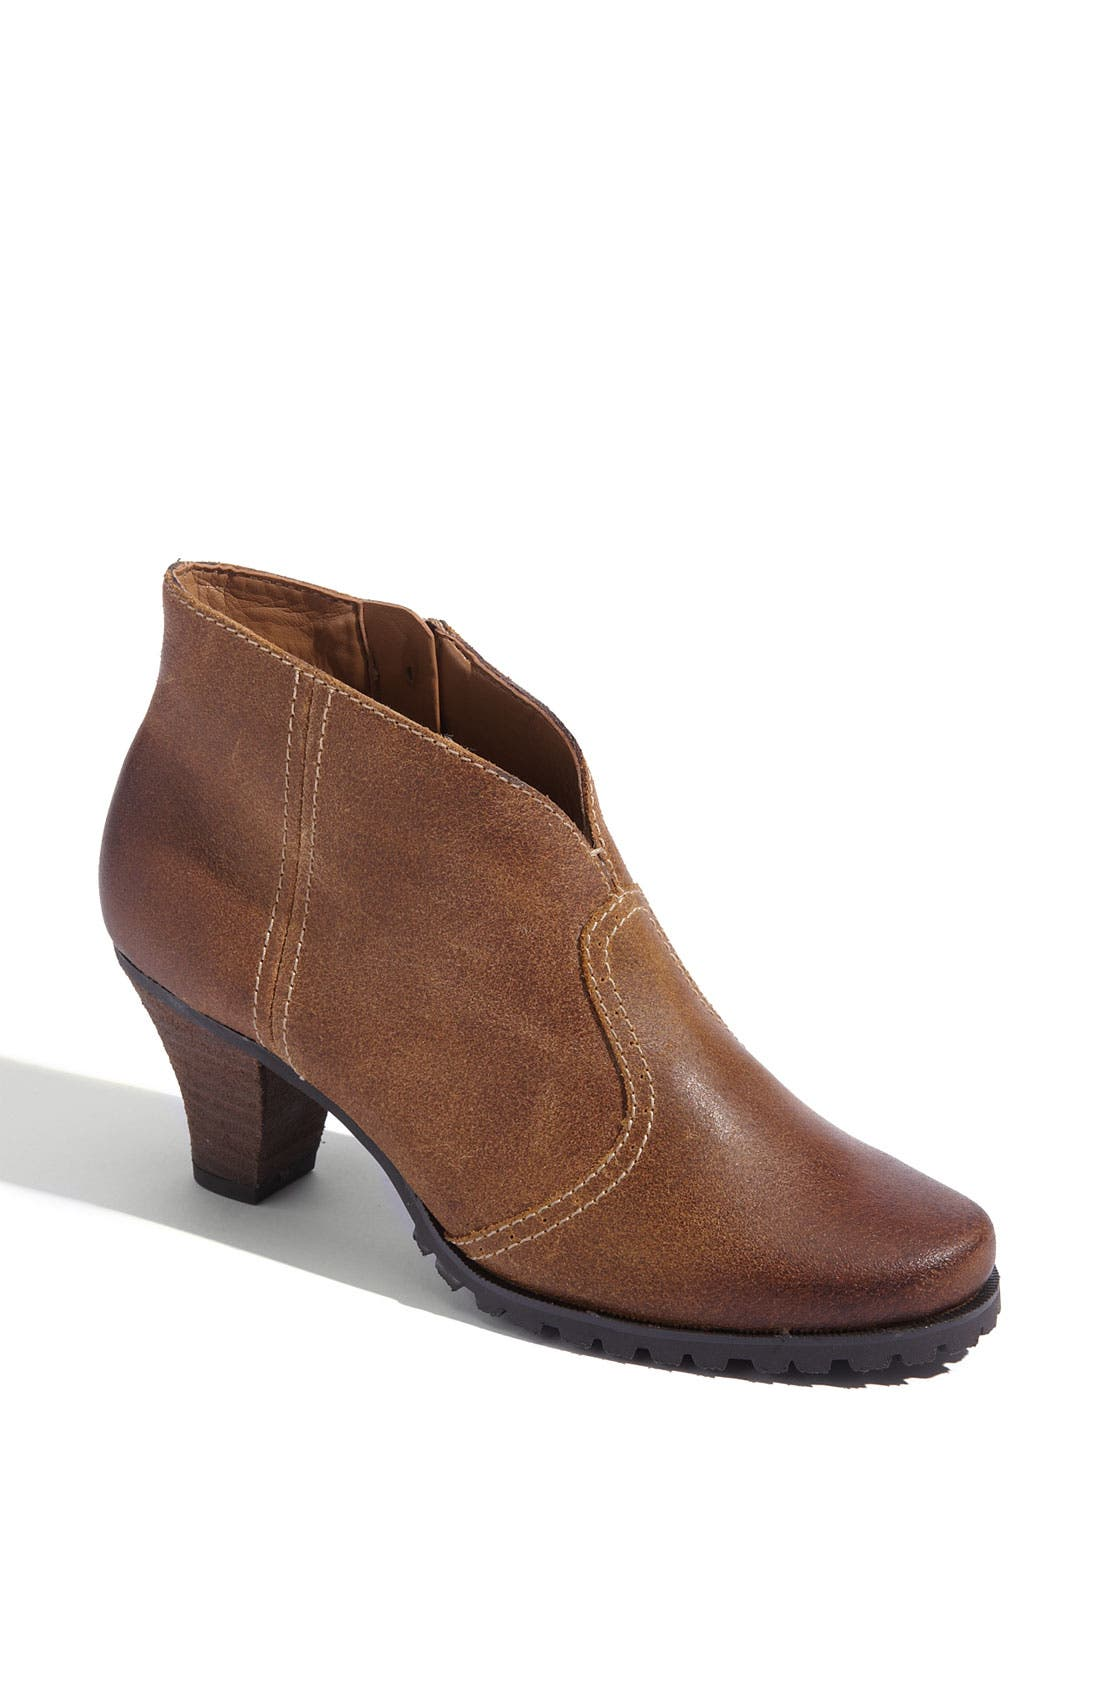 Alternate Image 1 Selected - SoftWalk® 'Dakota' Boot